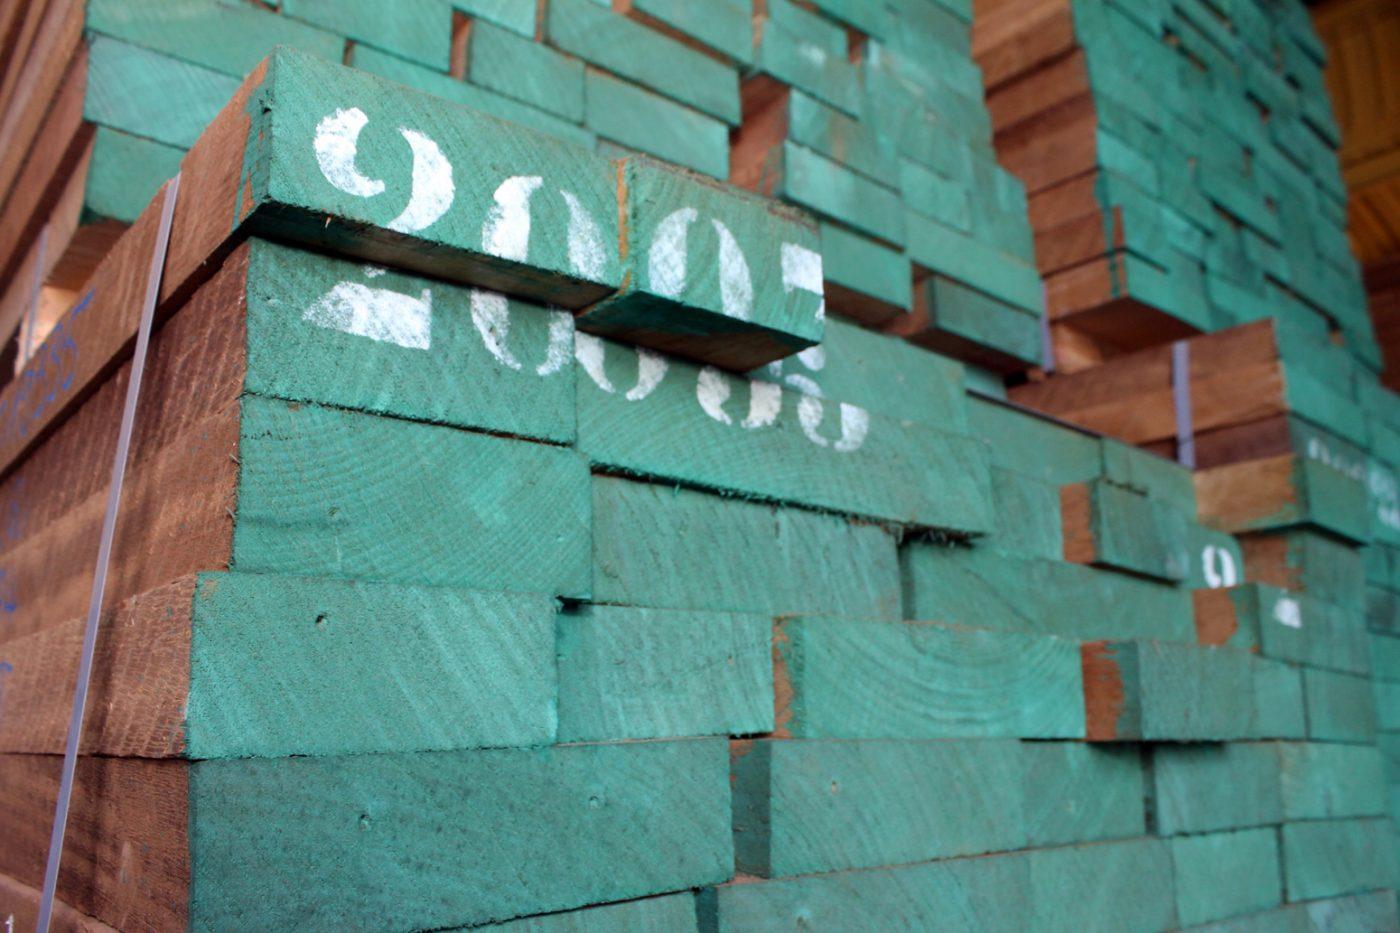 INVOICEGREEN activa el mercado del Iroko seco de marca SIM